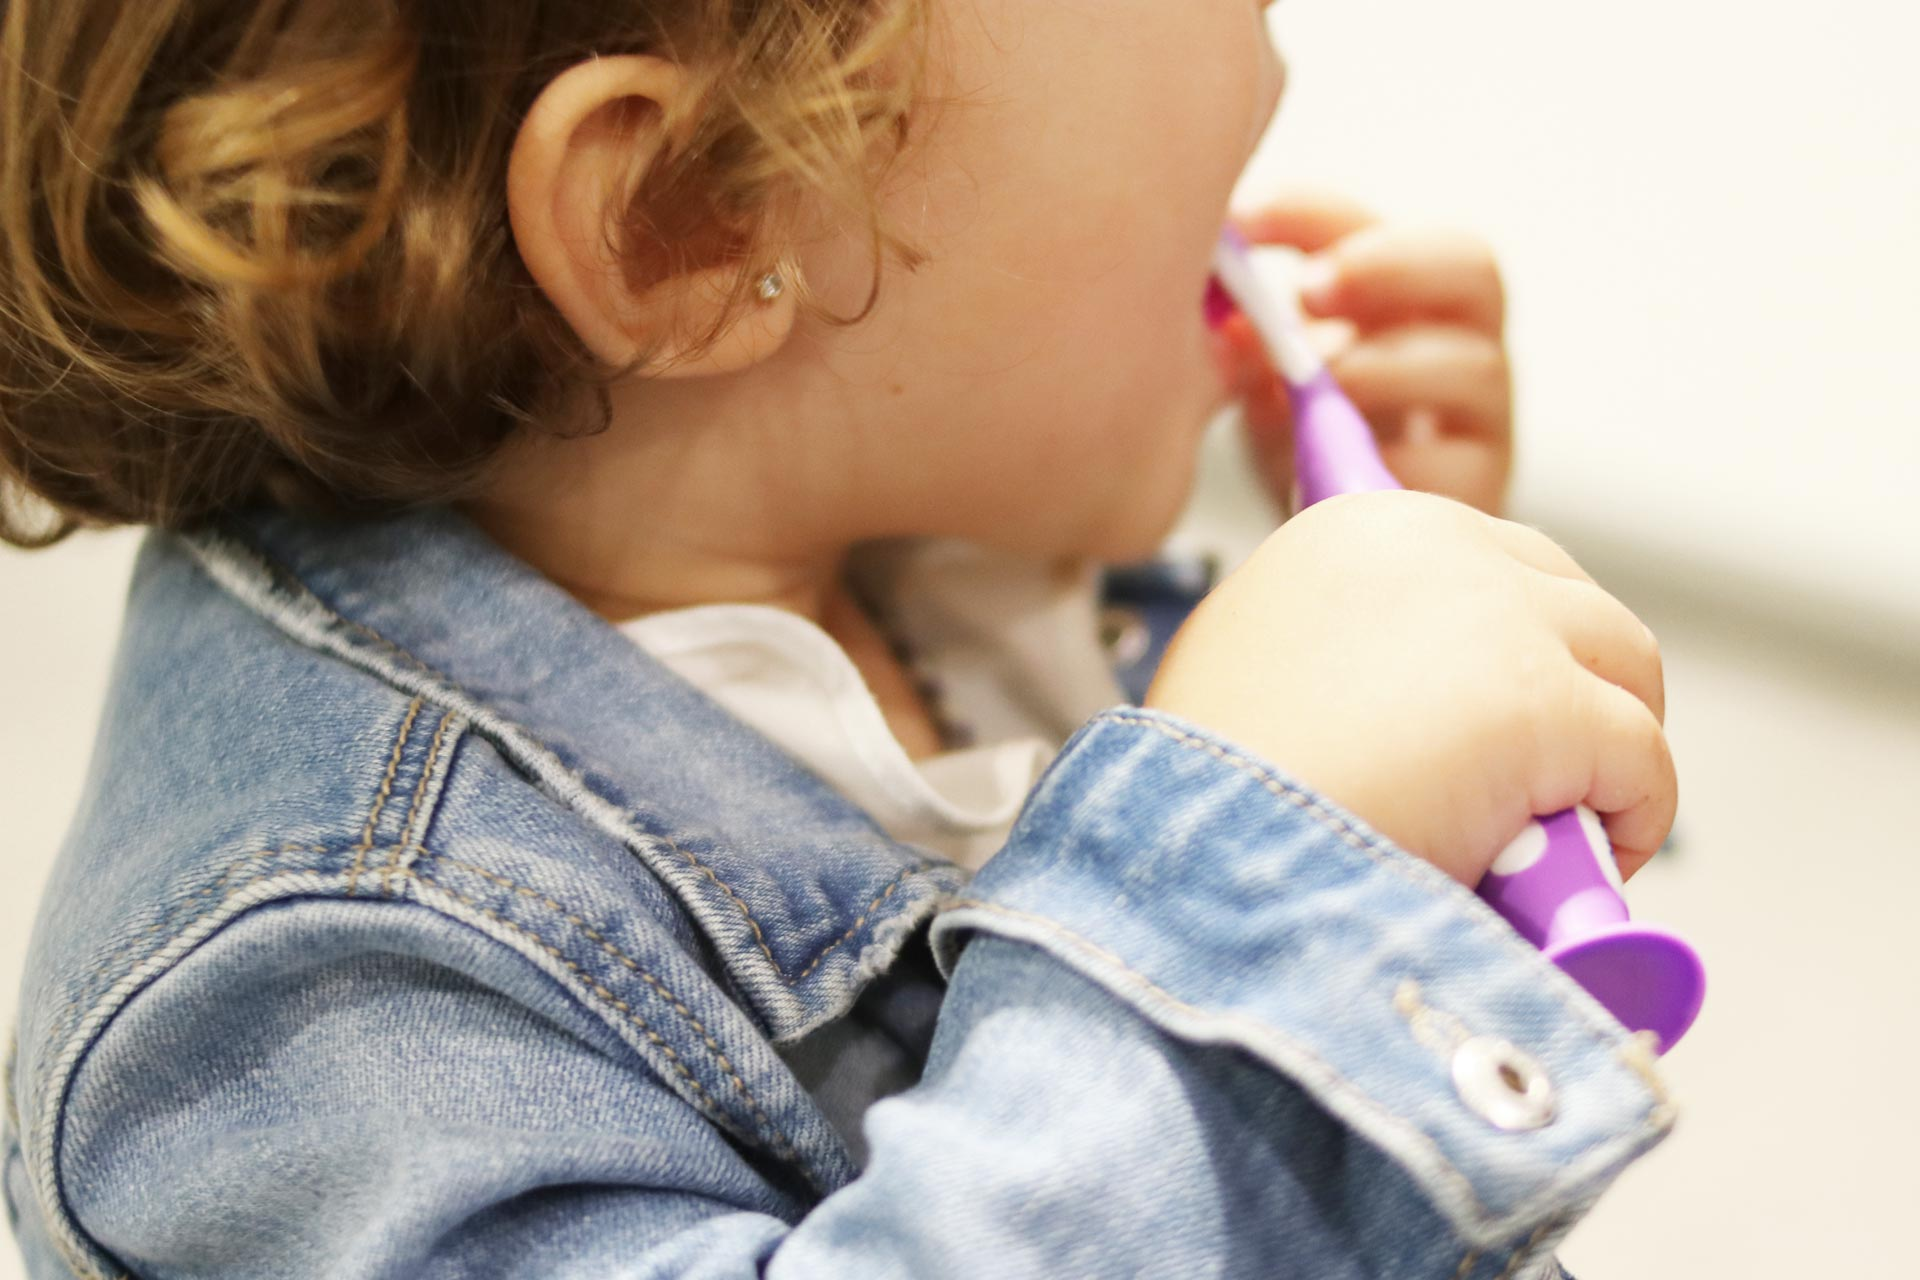 Cómo tratar la caries infantil